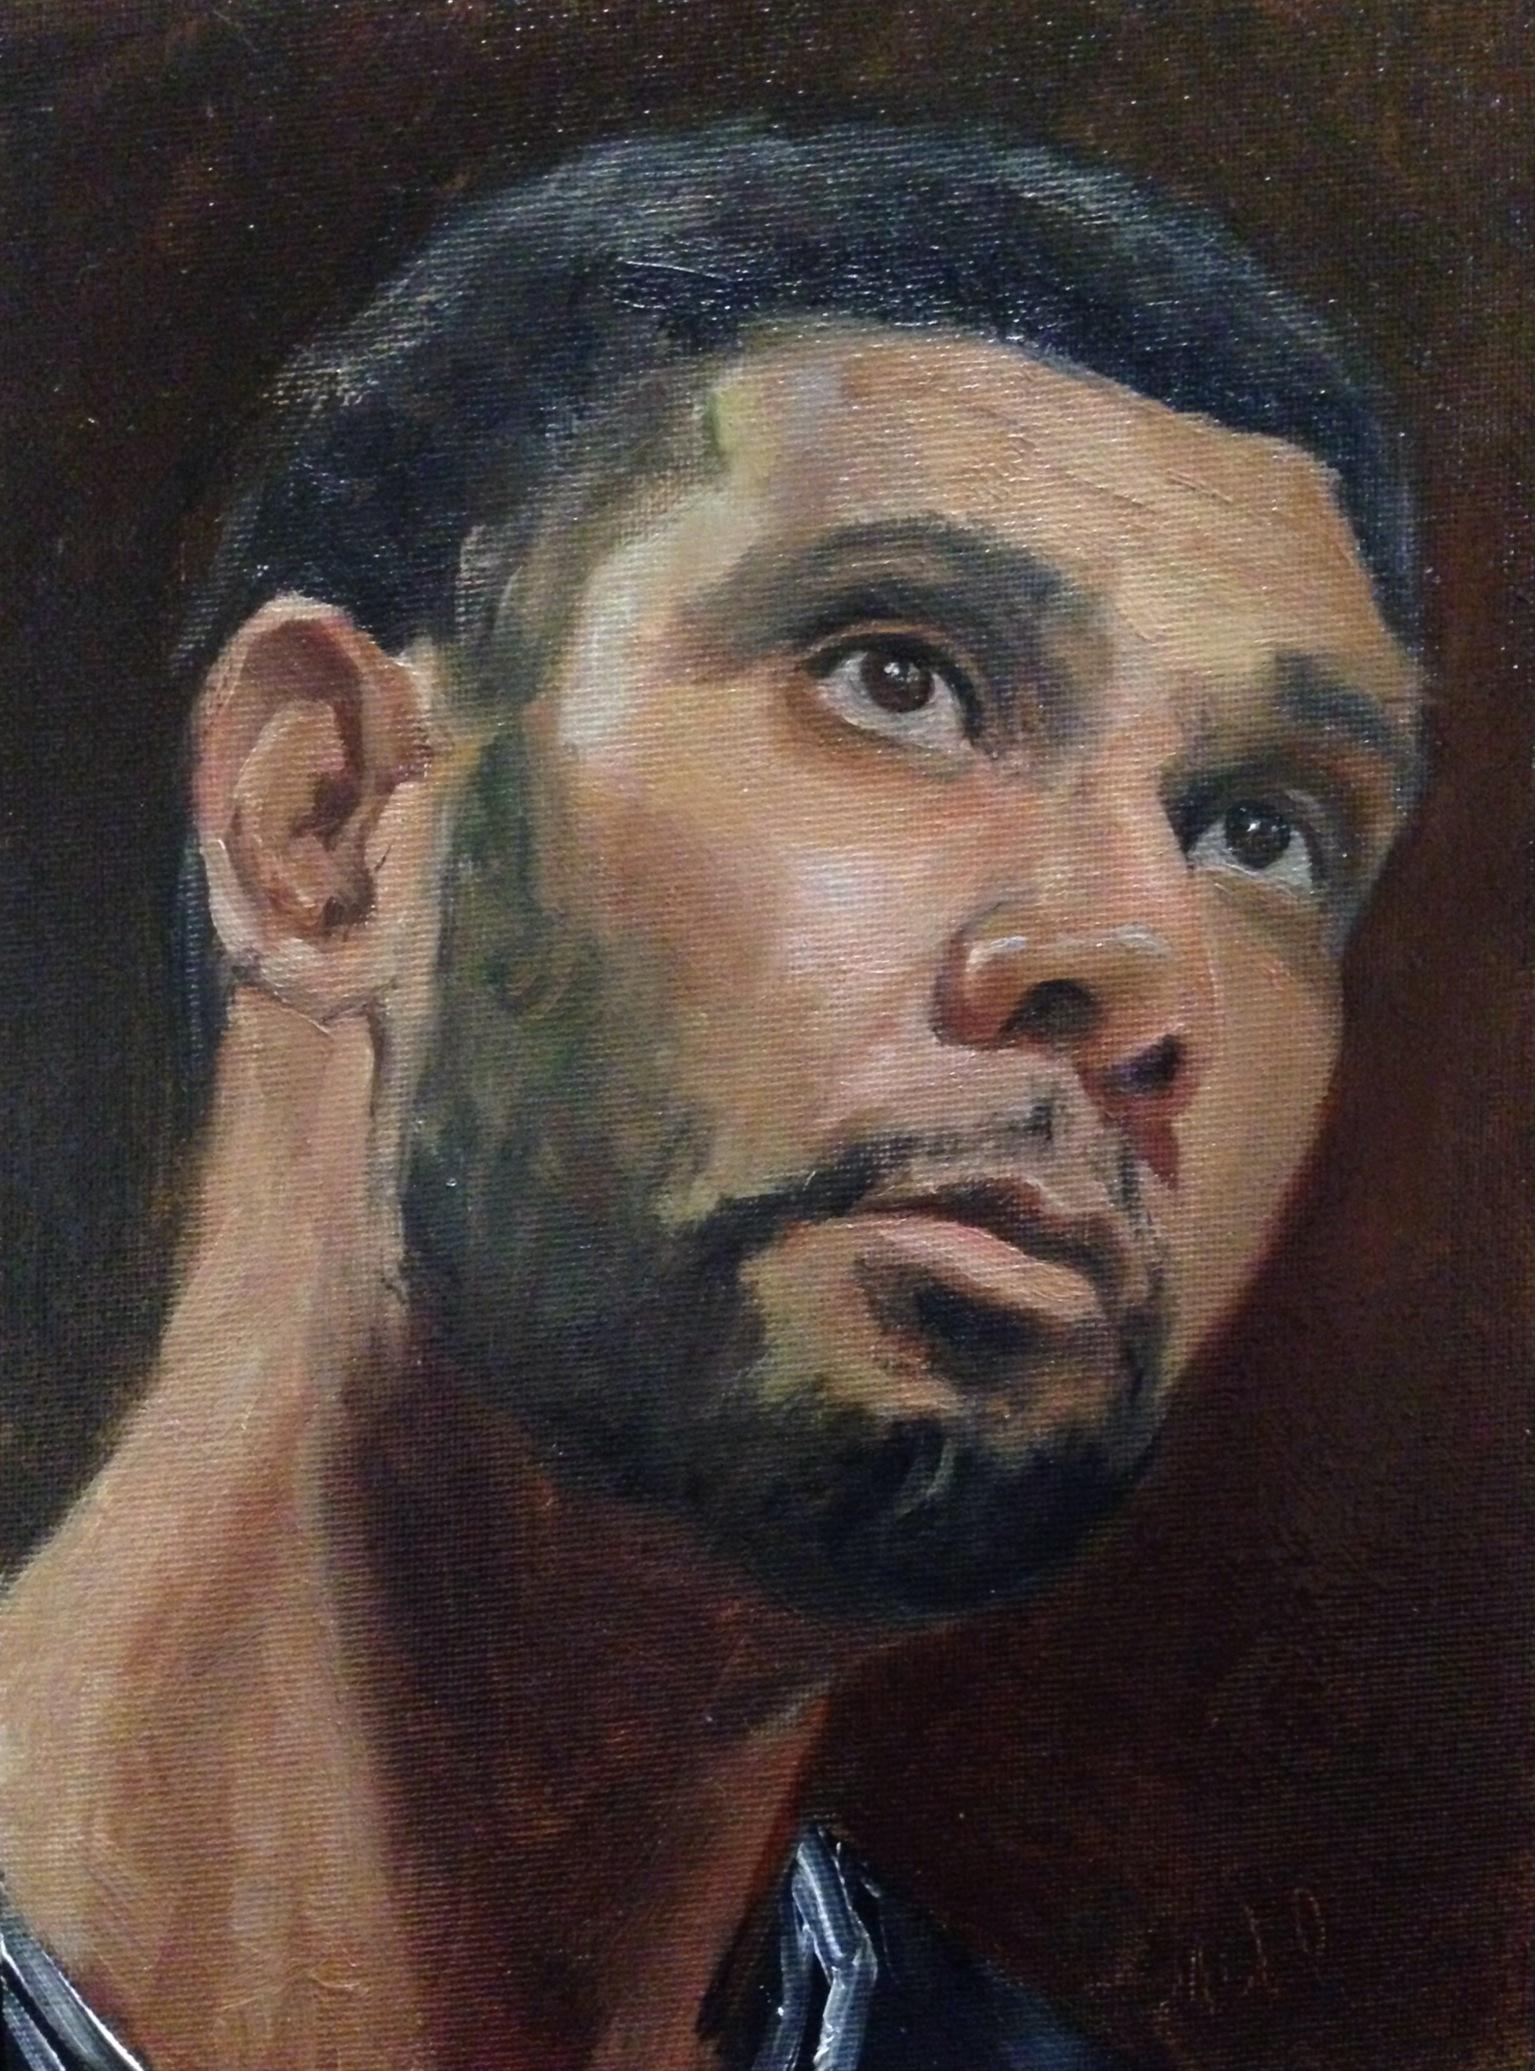 a portrait of tim duncan pounding the rock